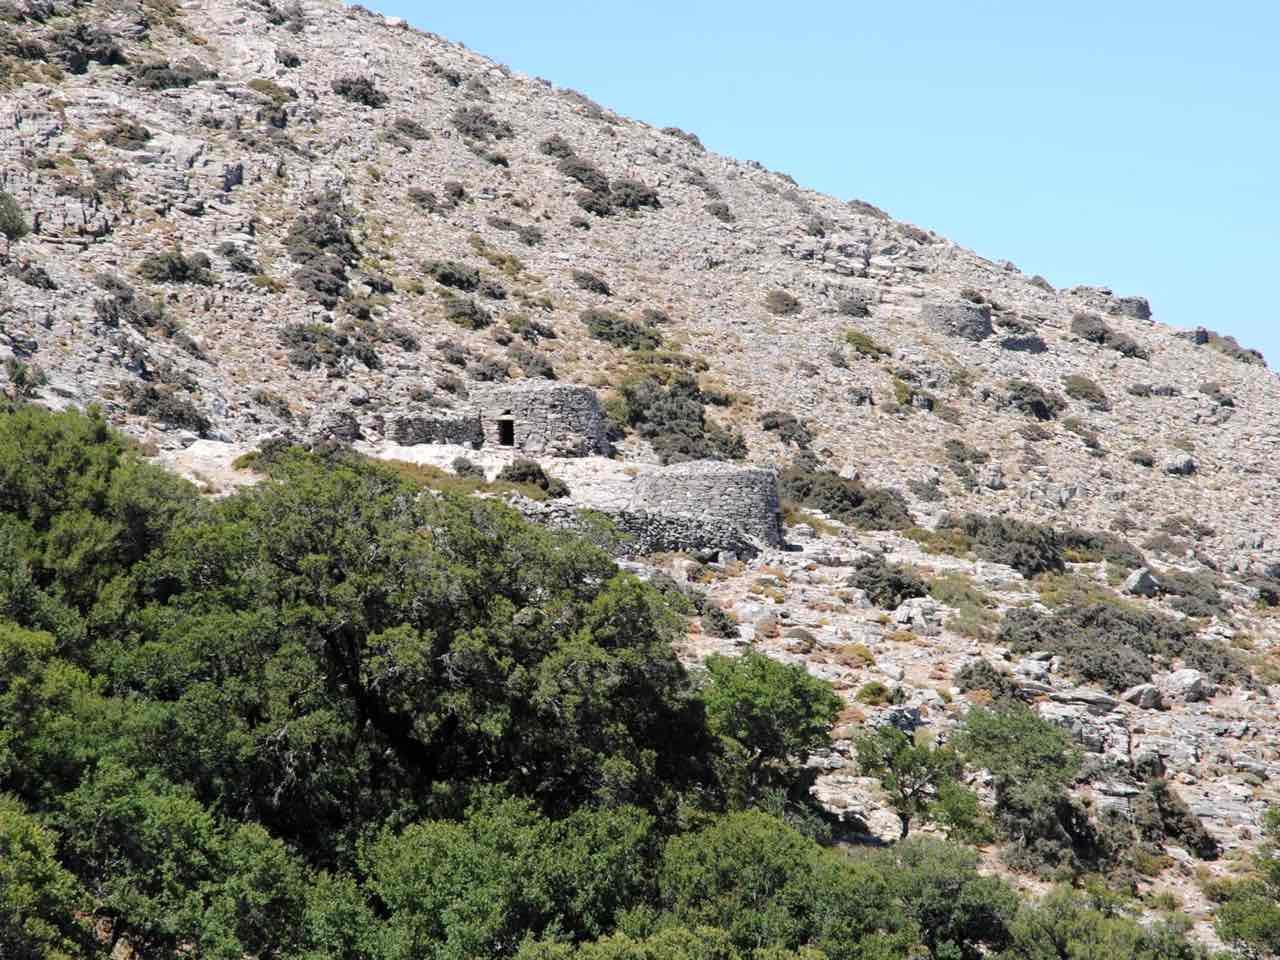 Trekking In The Highlands Of Psiloritis Natural Park - Geopark of Unesco, european geoparks, ida mountain trekking, geopark unesco crete greece, natural park trekking, best activities rethymno crete, rethimno things to do, hiking psiloritis mountain tour